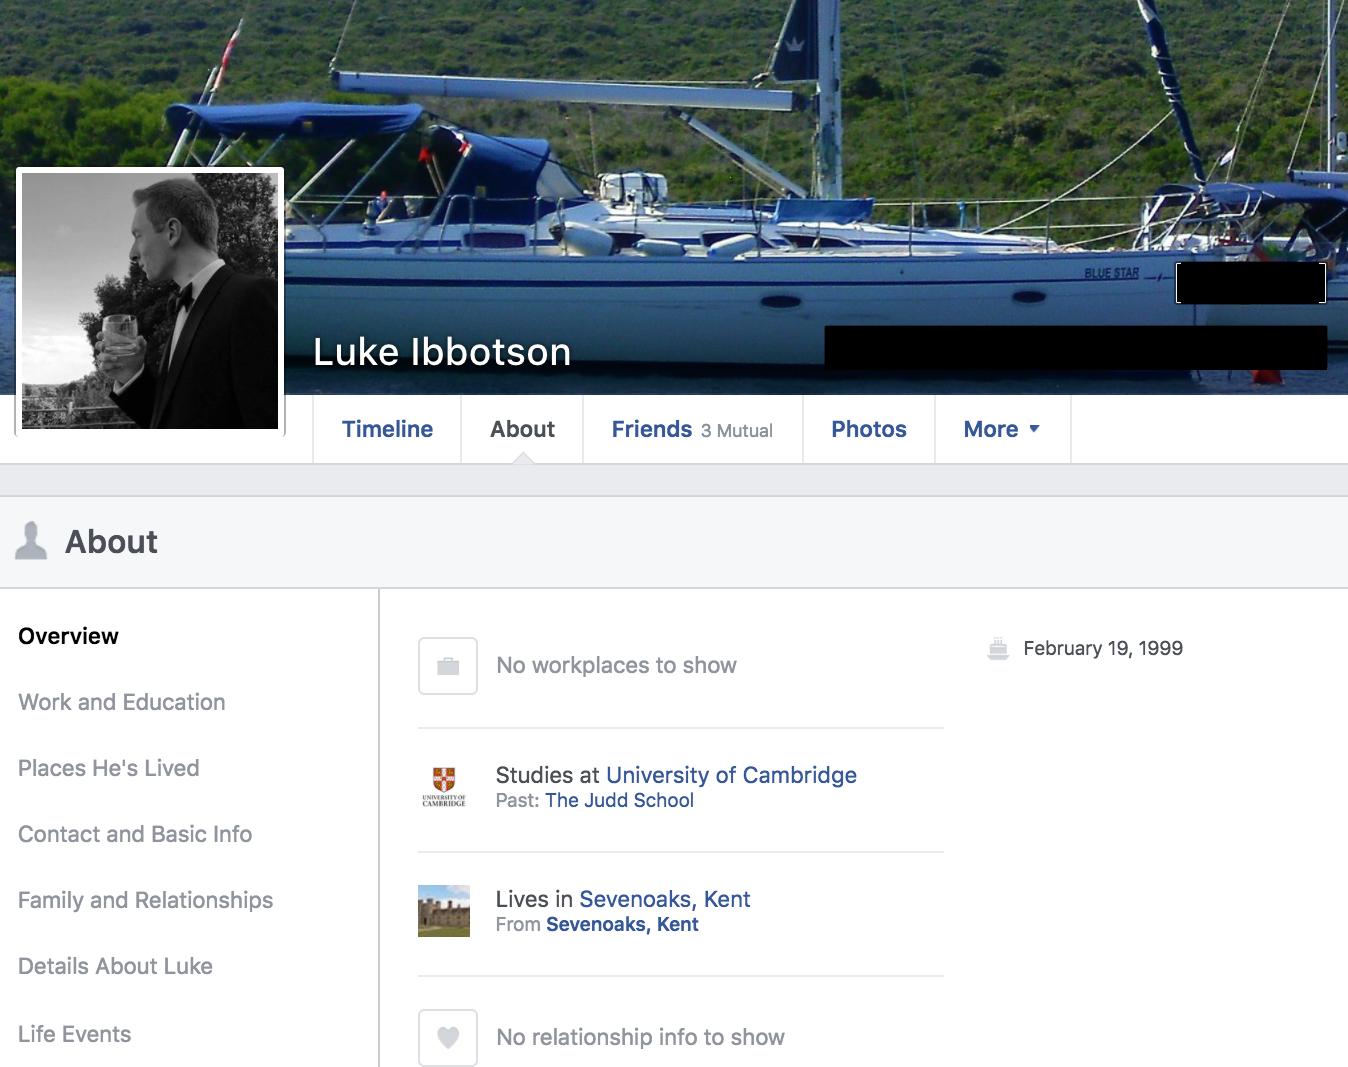 Luke Ibbotson Activate Facebook